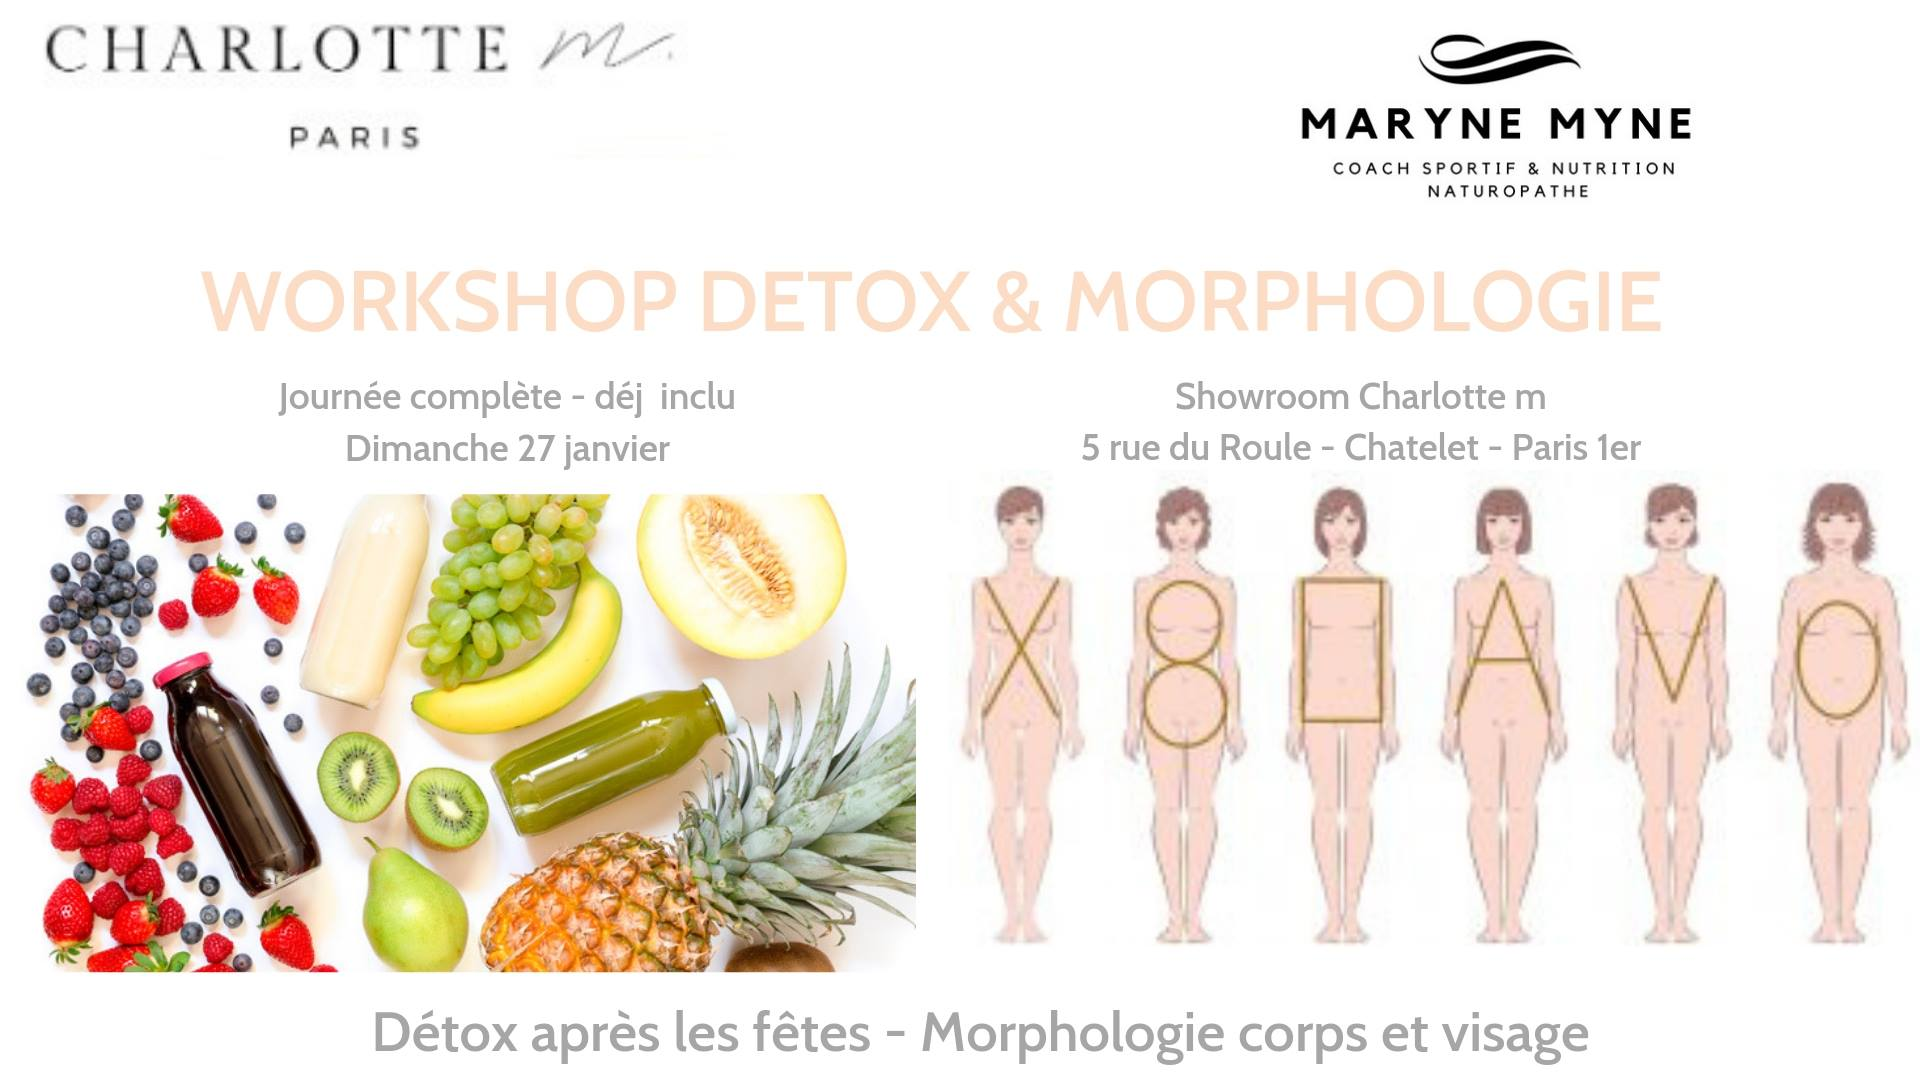 Paris Food & Drink Events January